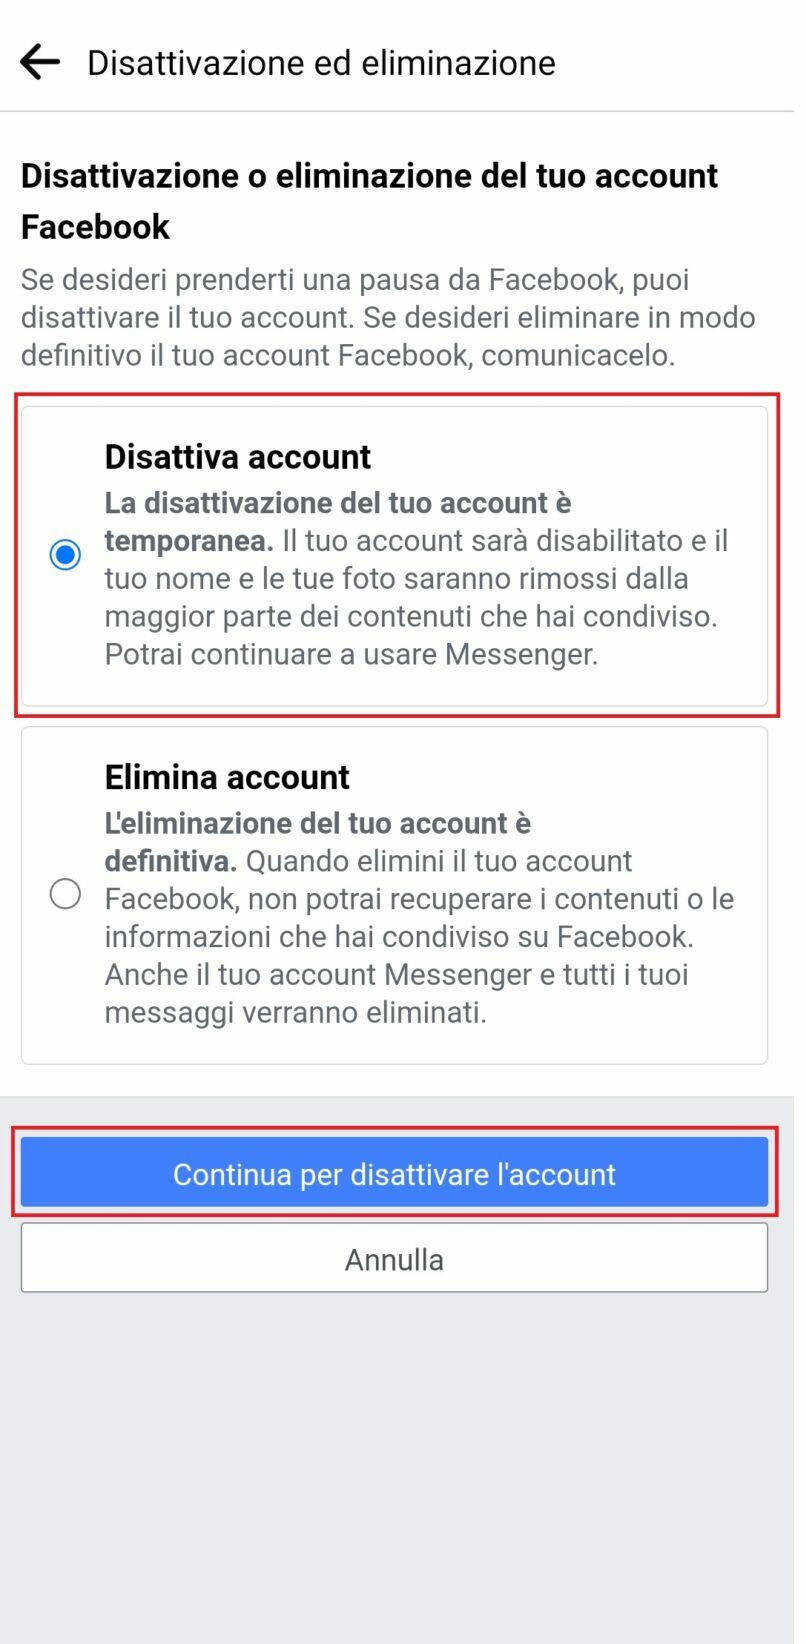 disattivazione account Facebook o eliminazione account Facebook